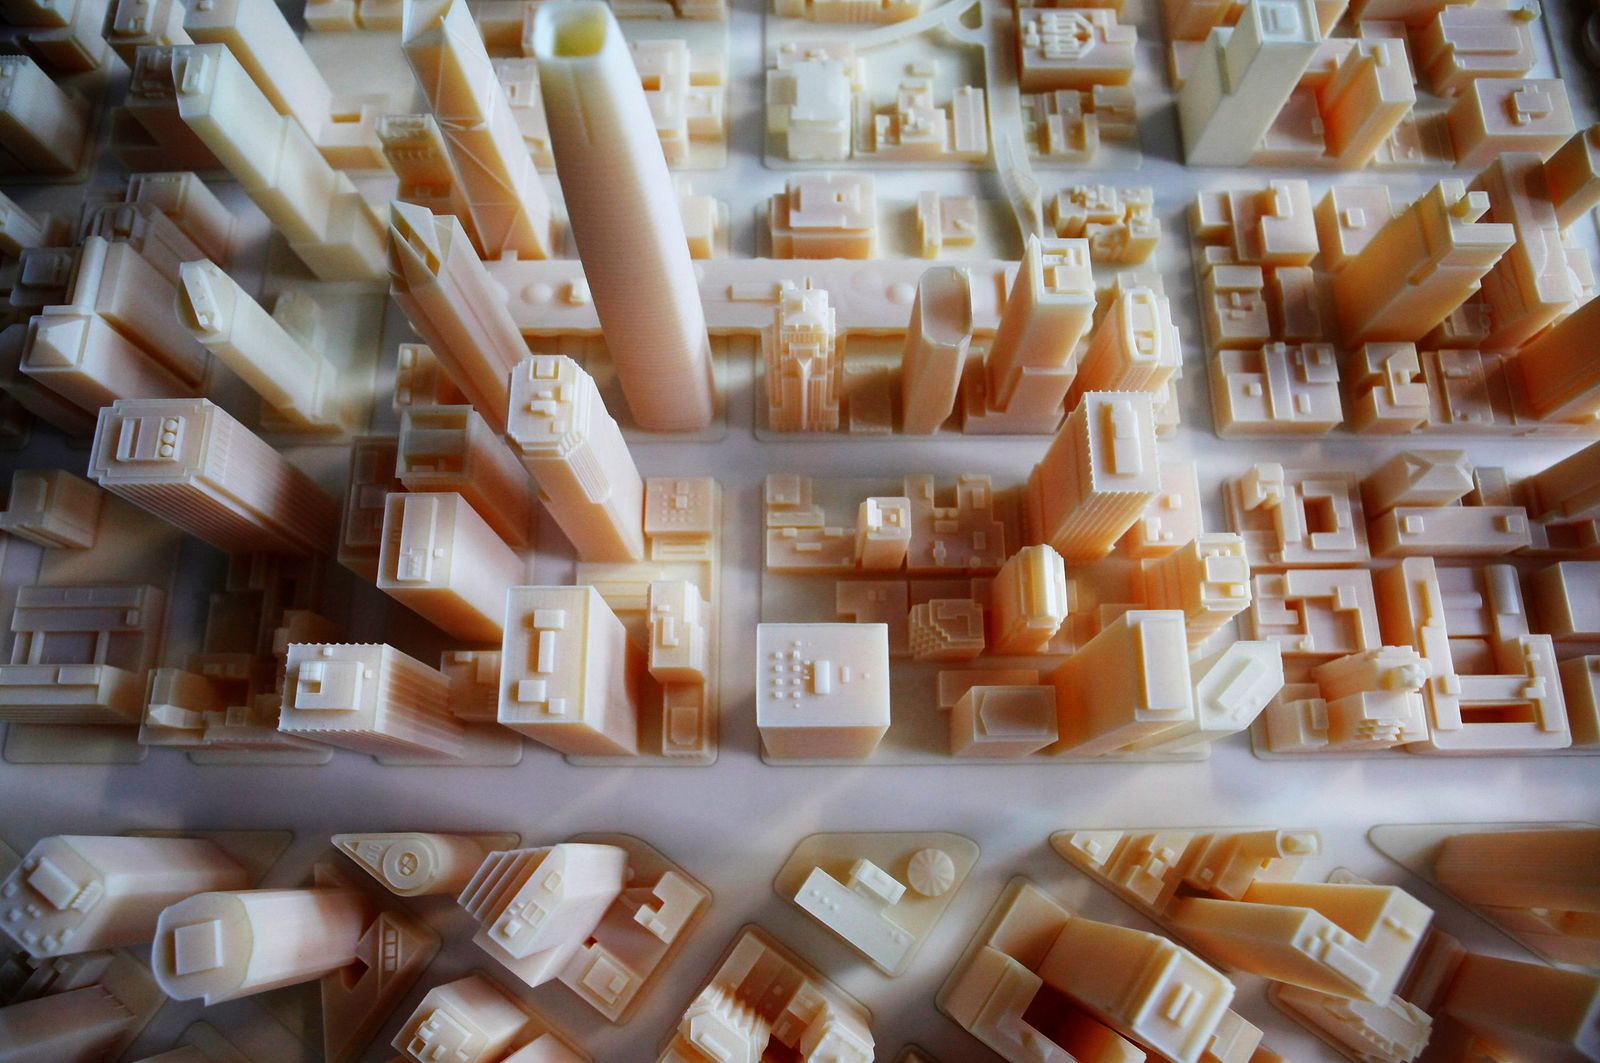 SF future skyline created by 3D printer